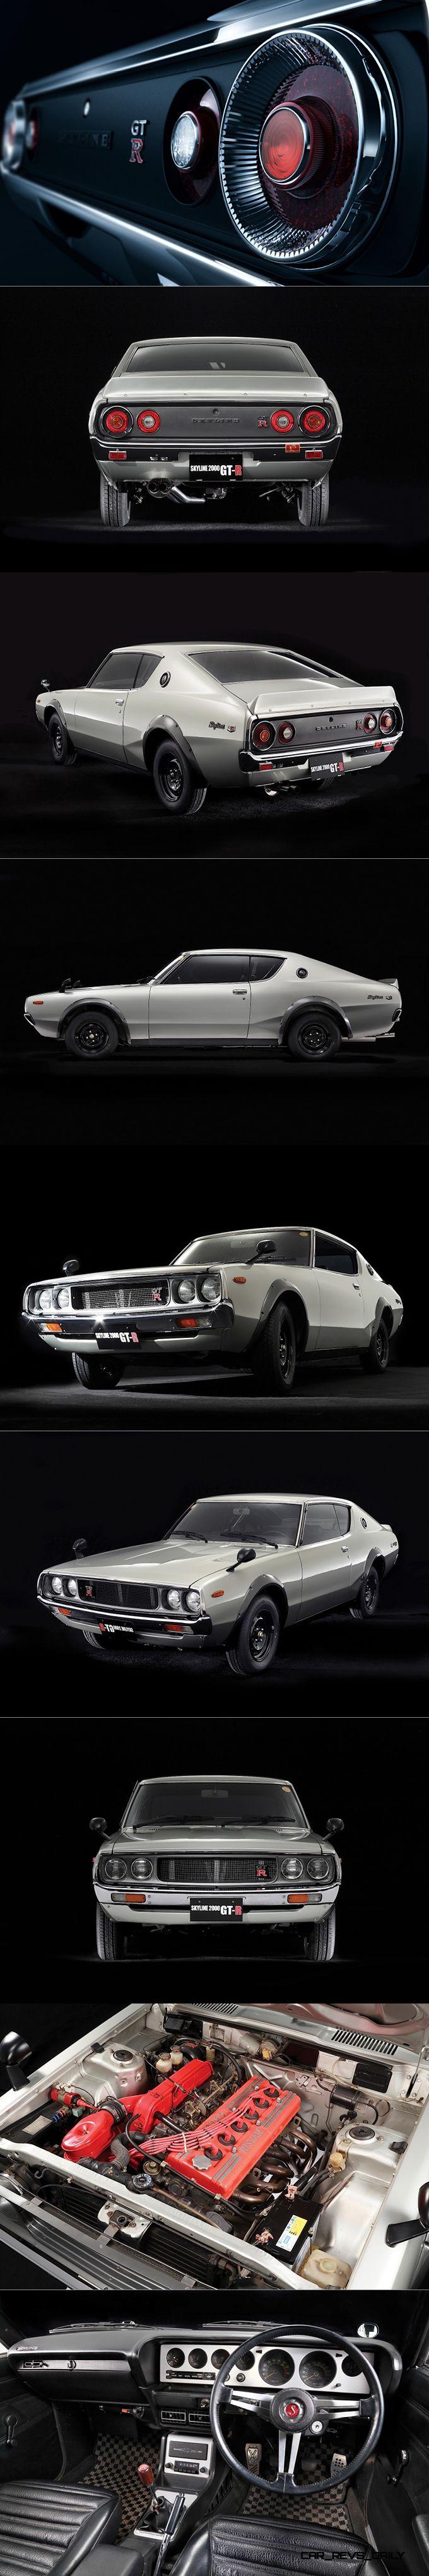 1972 Nissan Skyline GT-R / C110 / Japan / white